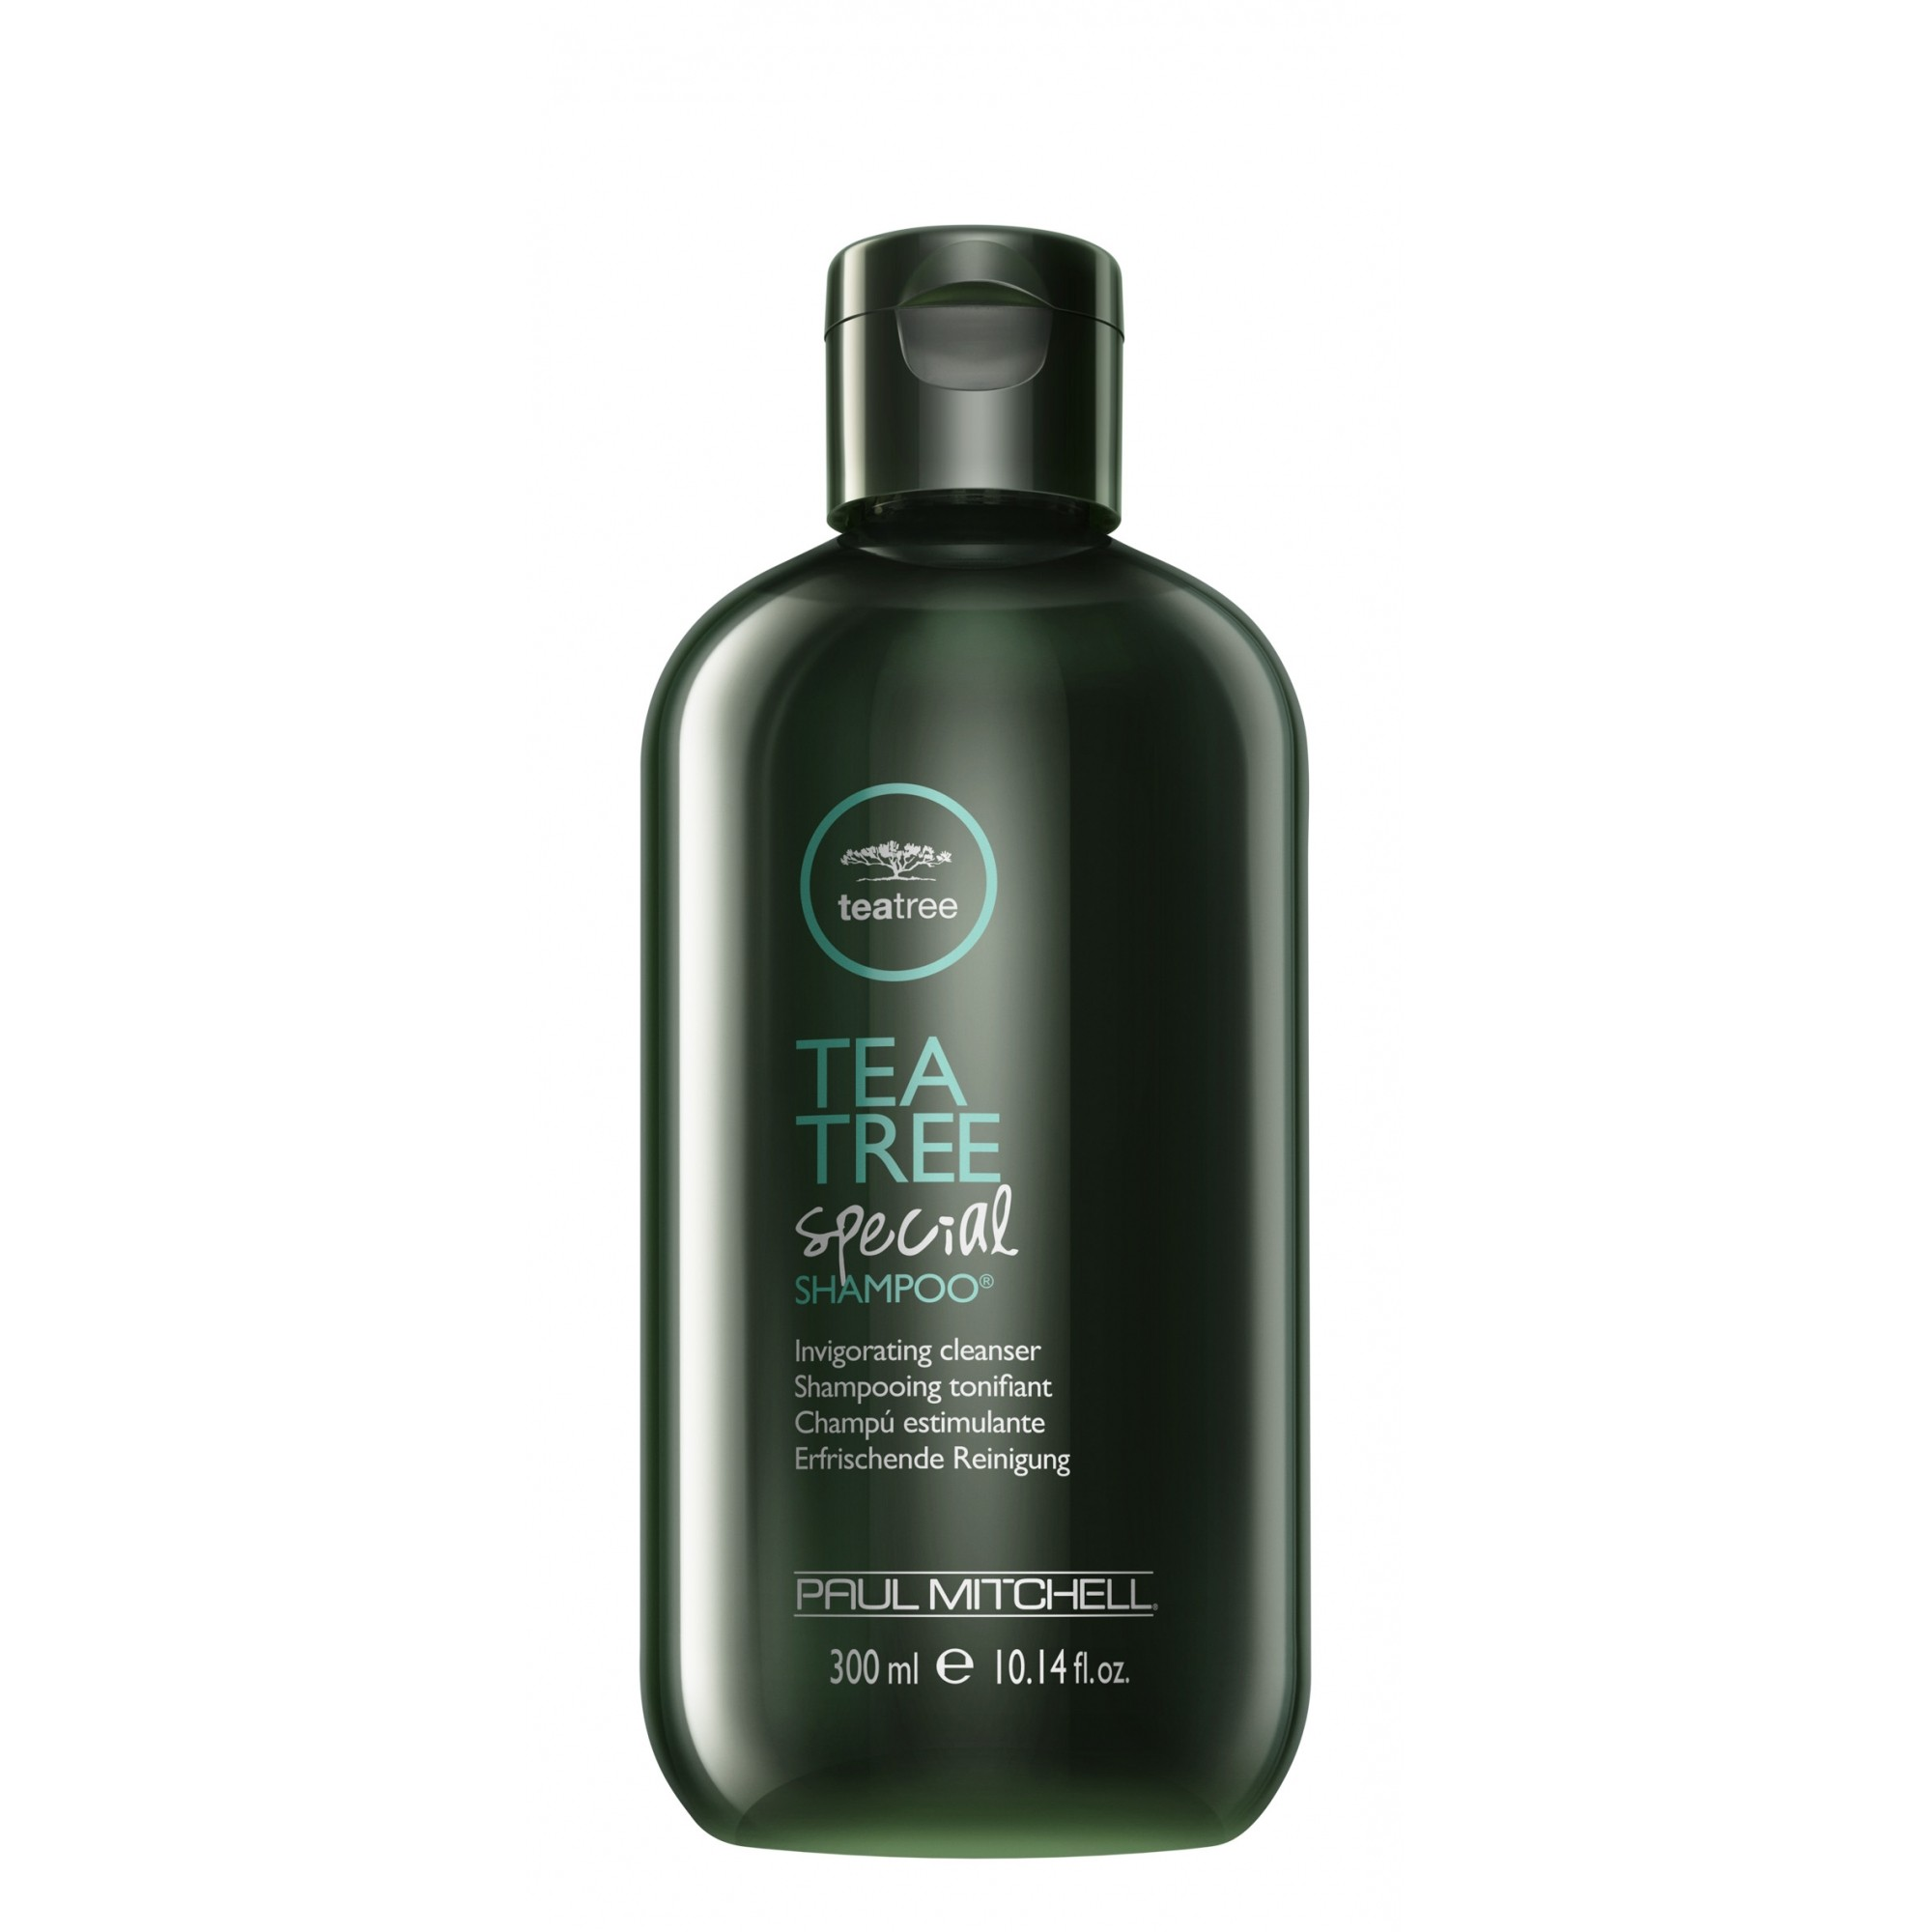 Shampoo Tea Tree Special (300ml)   PAUL MITCHELL